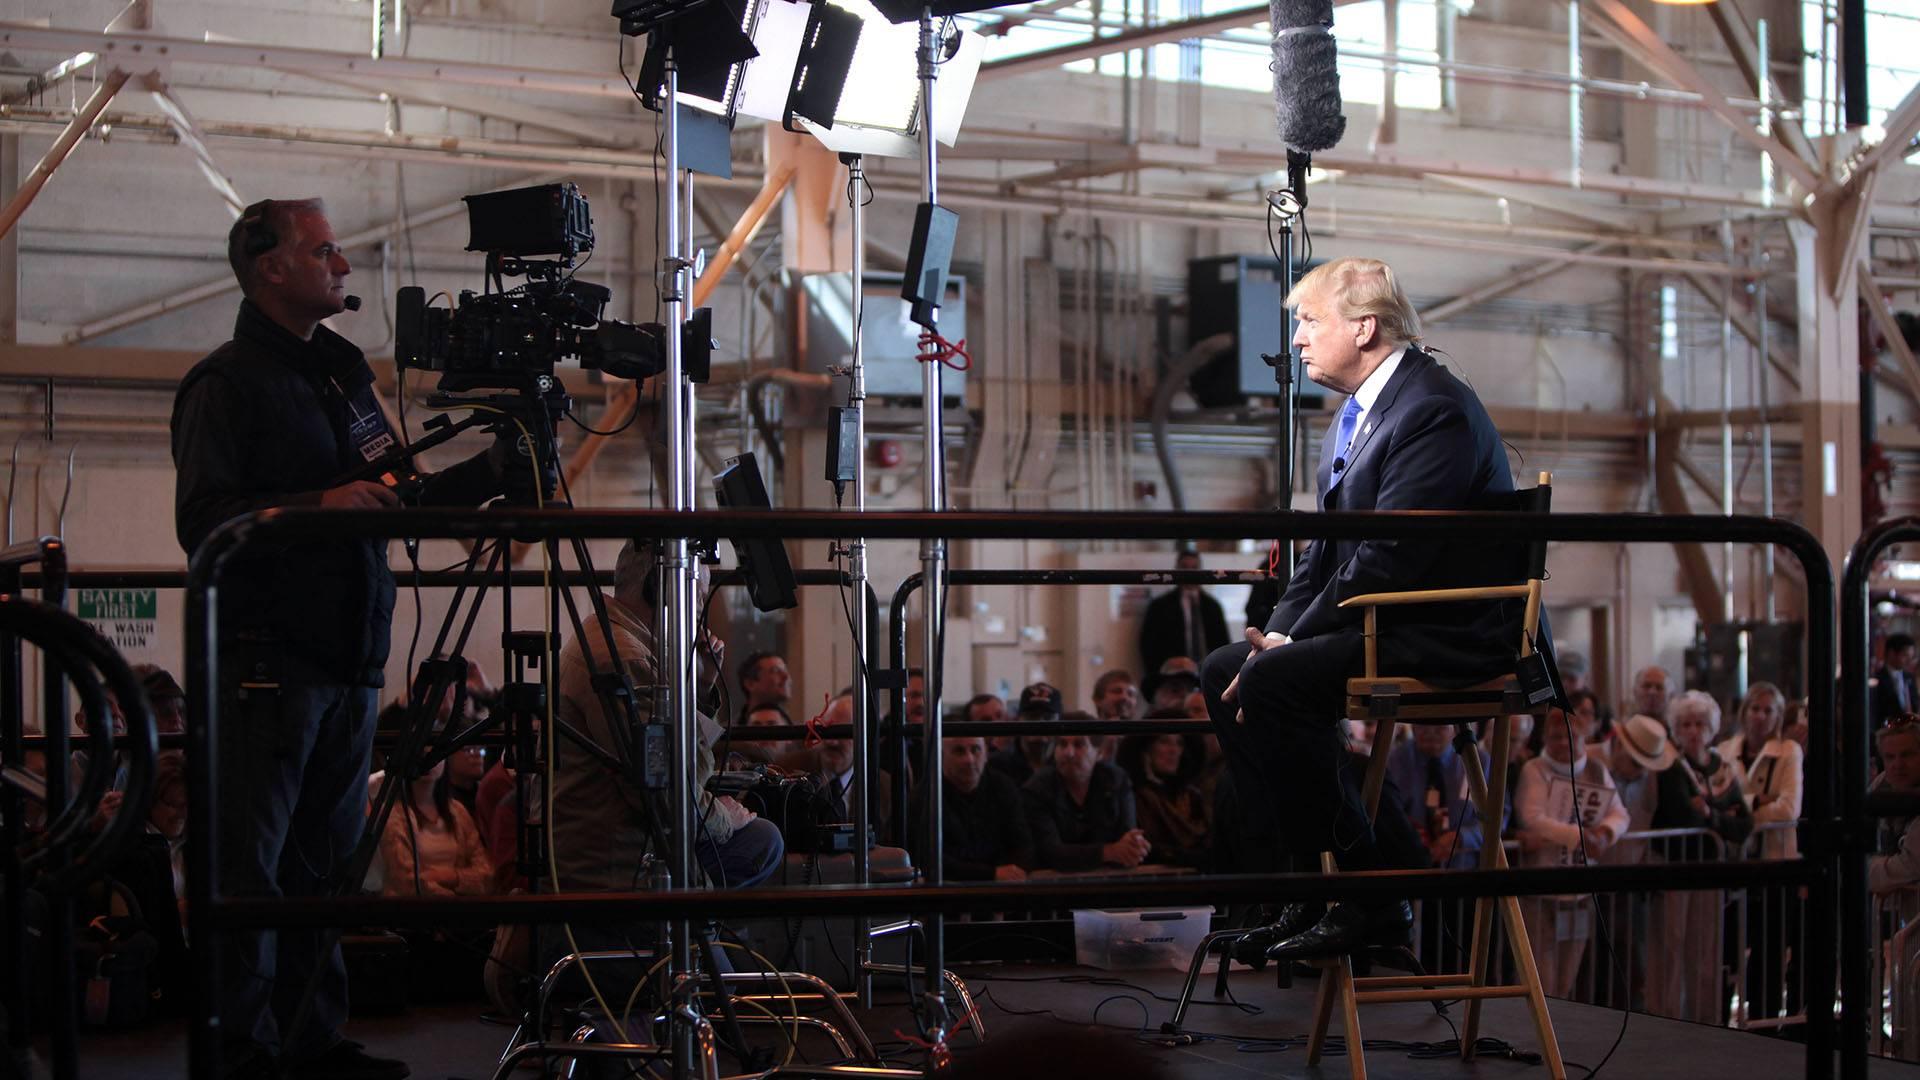 Vice Presidential Debate Debates Election 2016 Video Camera Circuit Board Front Flickr Photo Sharing Gage Skidmore